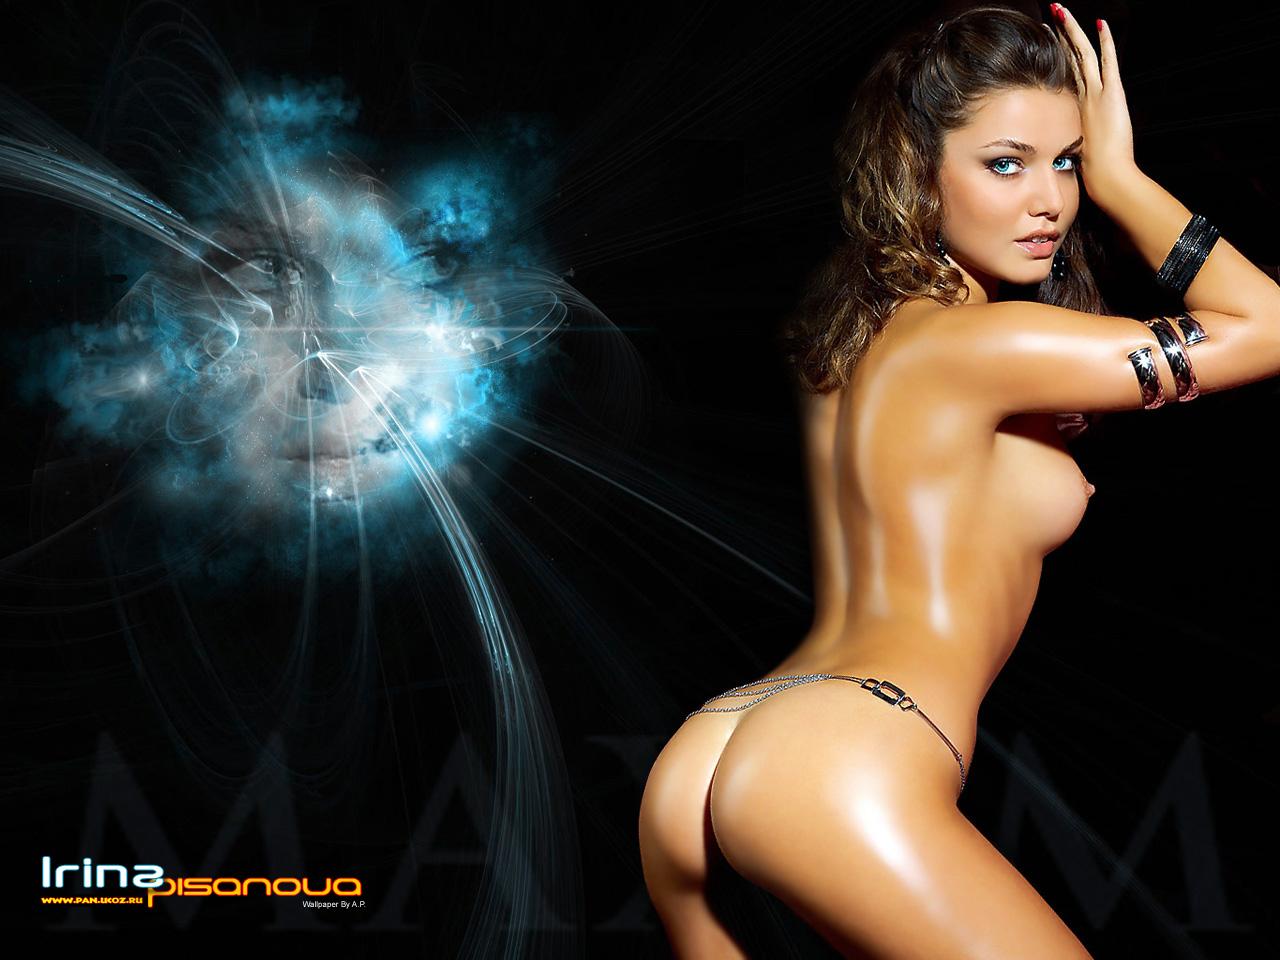 irina-pisanova-erotika